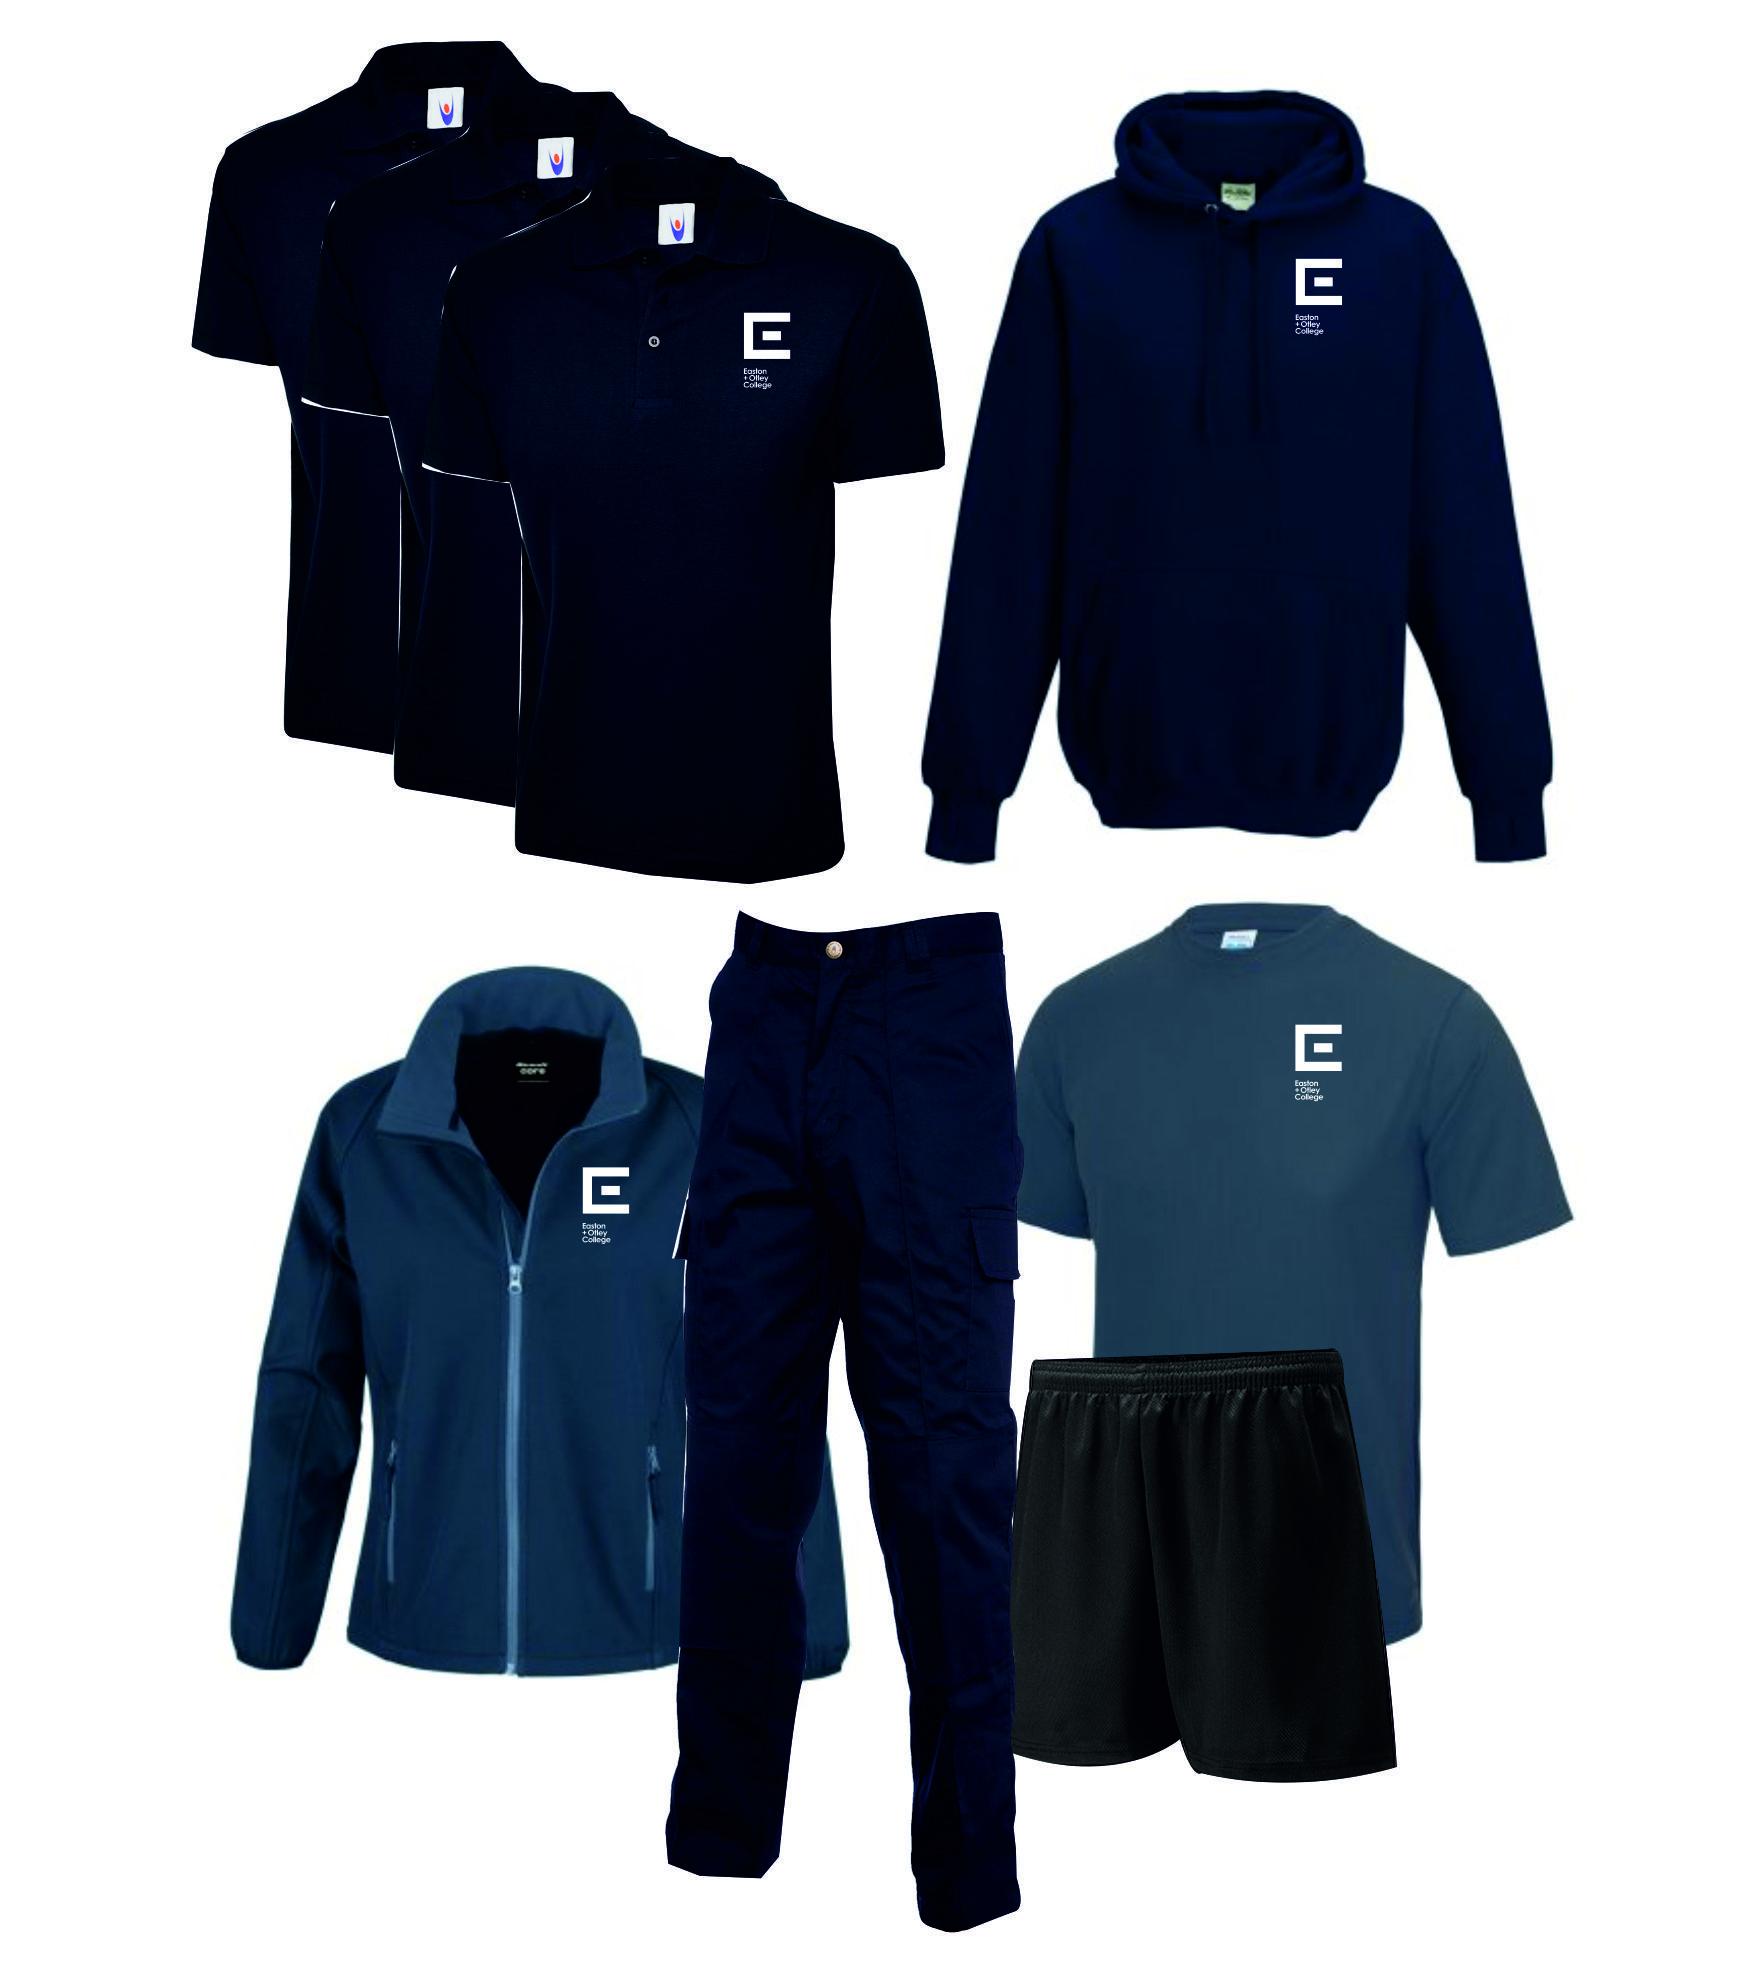 Easton PS Pack offer